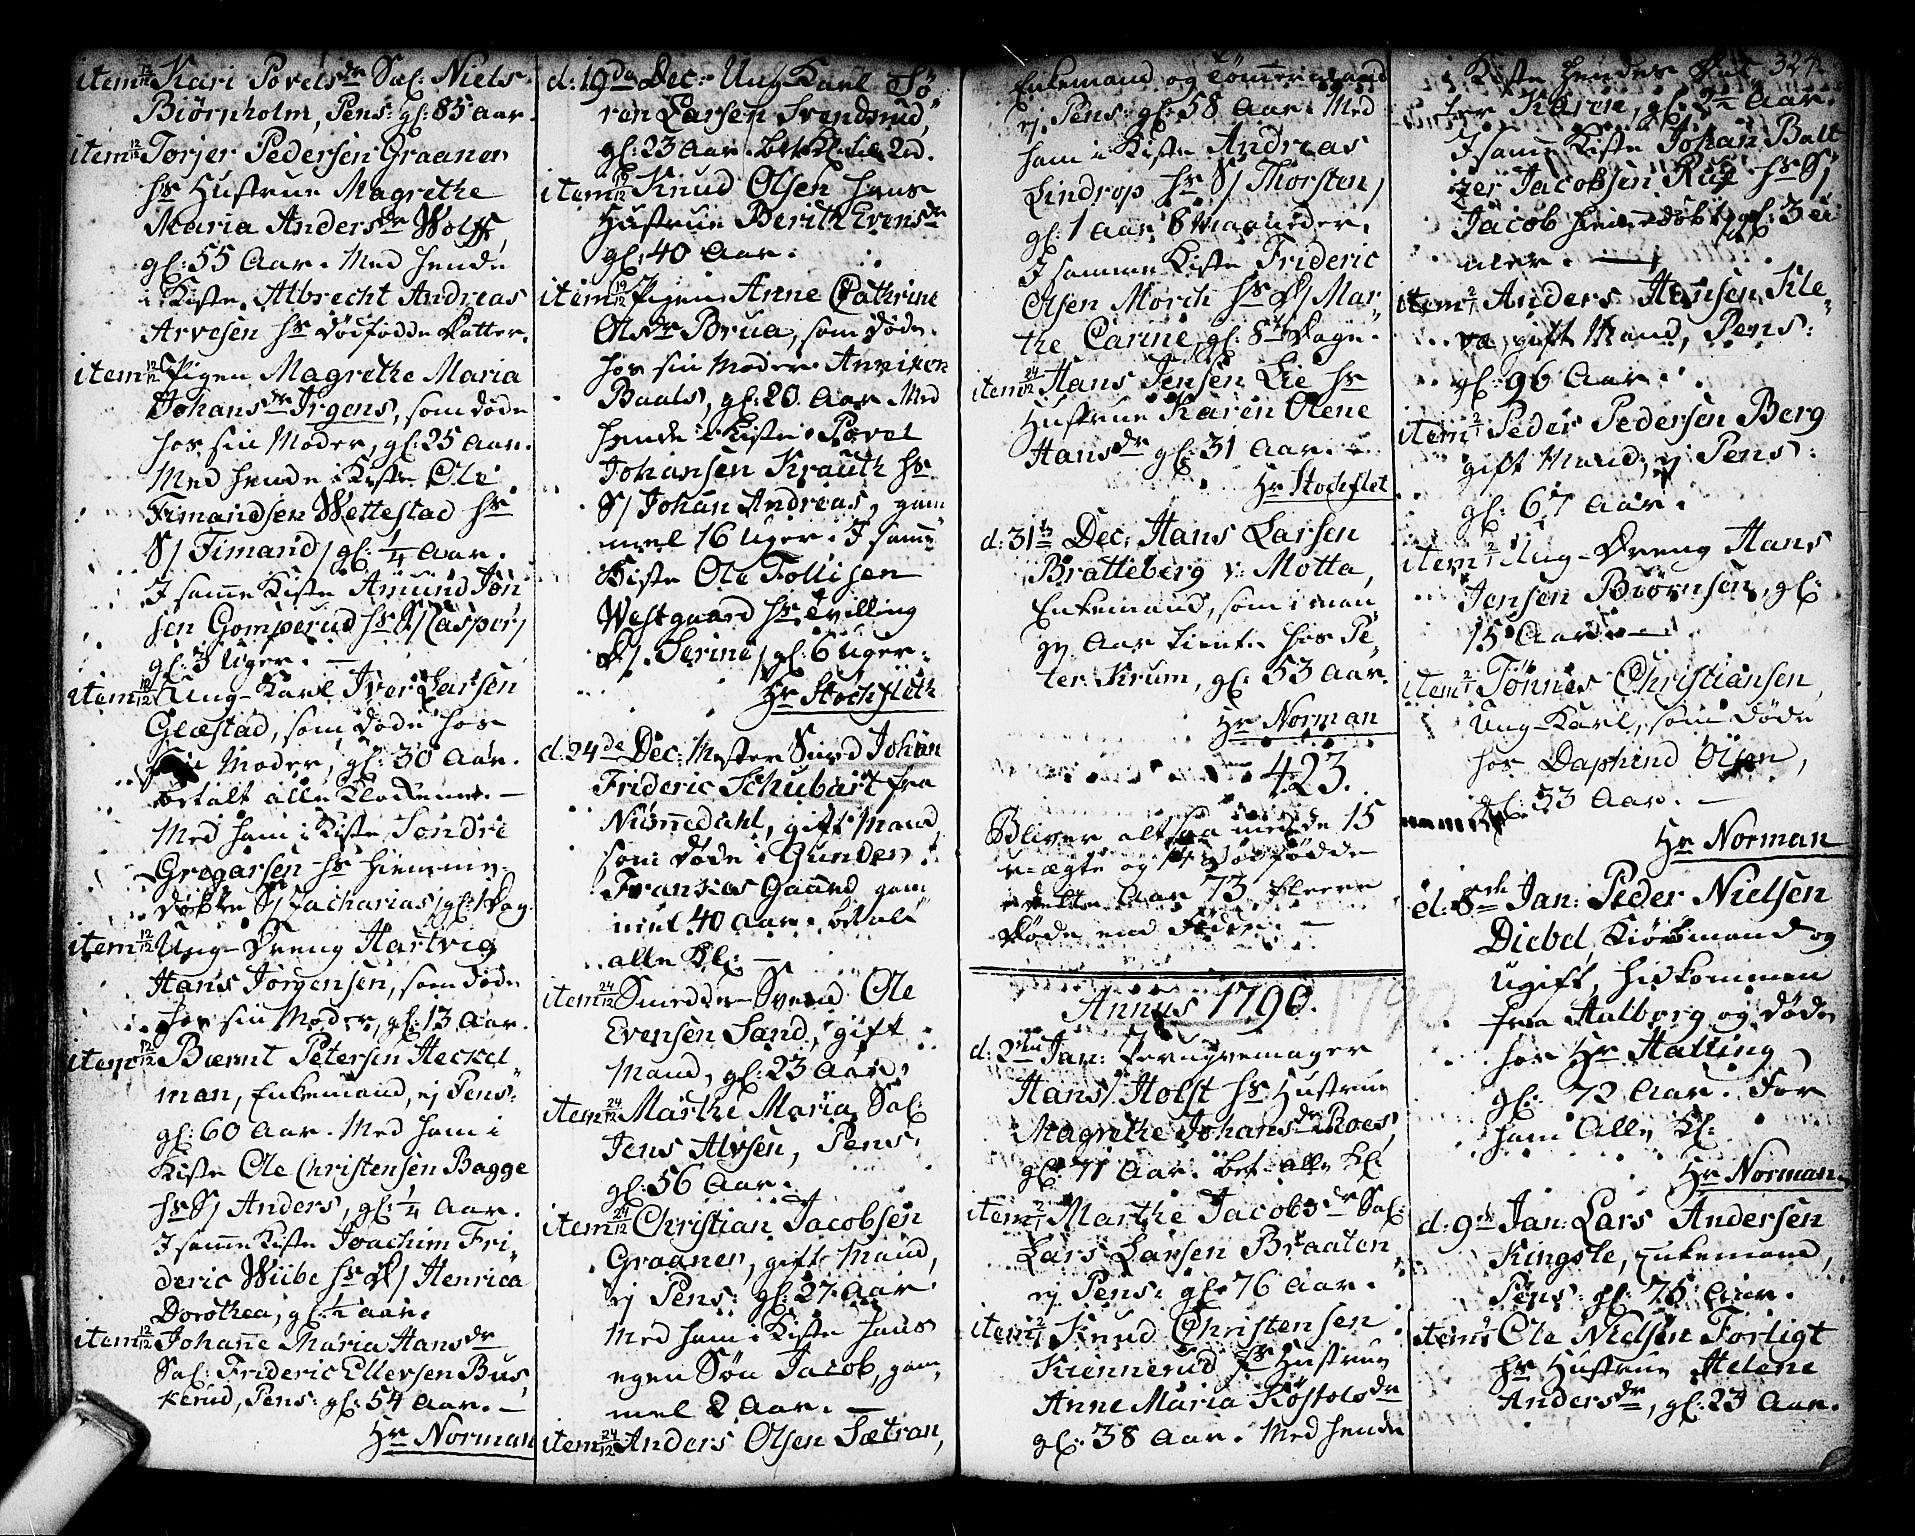 SAKO, Kongsberg kirkebøker, F/Fa/L0006: Parish register (official) no. I 6, 1783-1797, p. 324